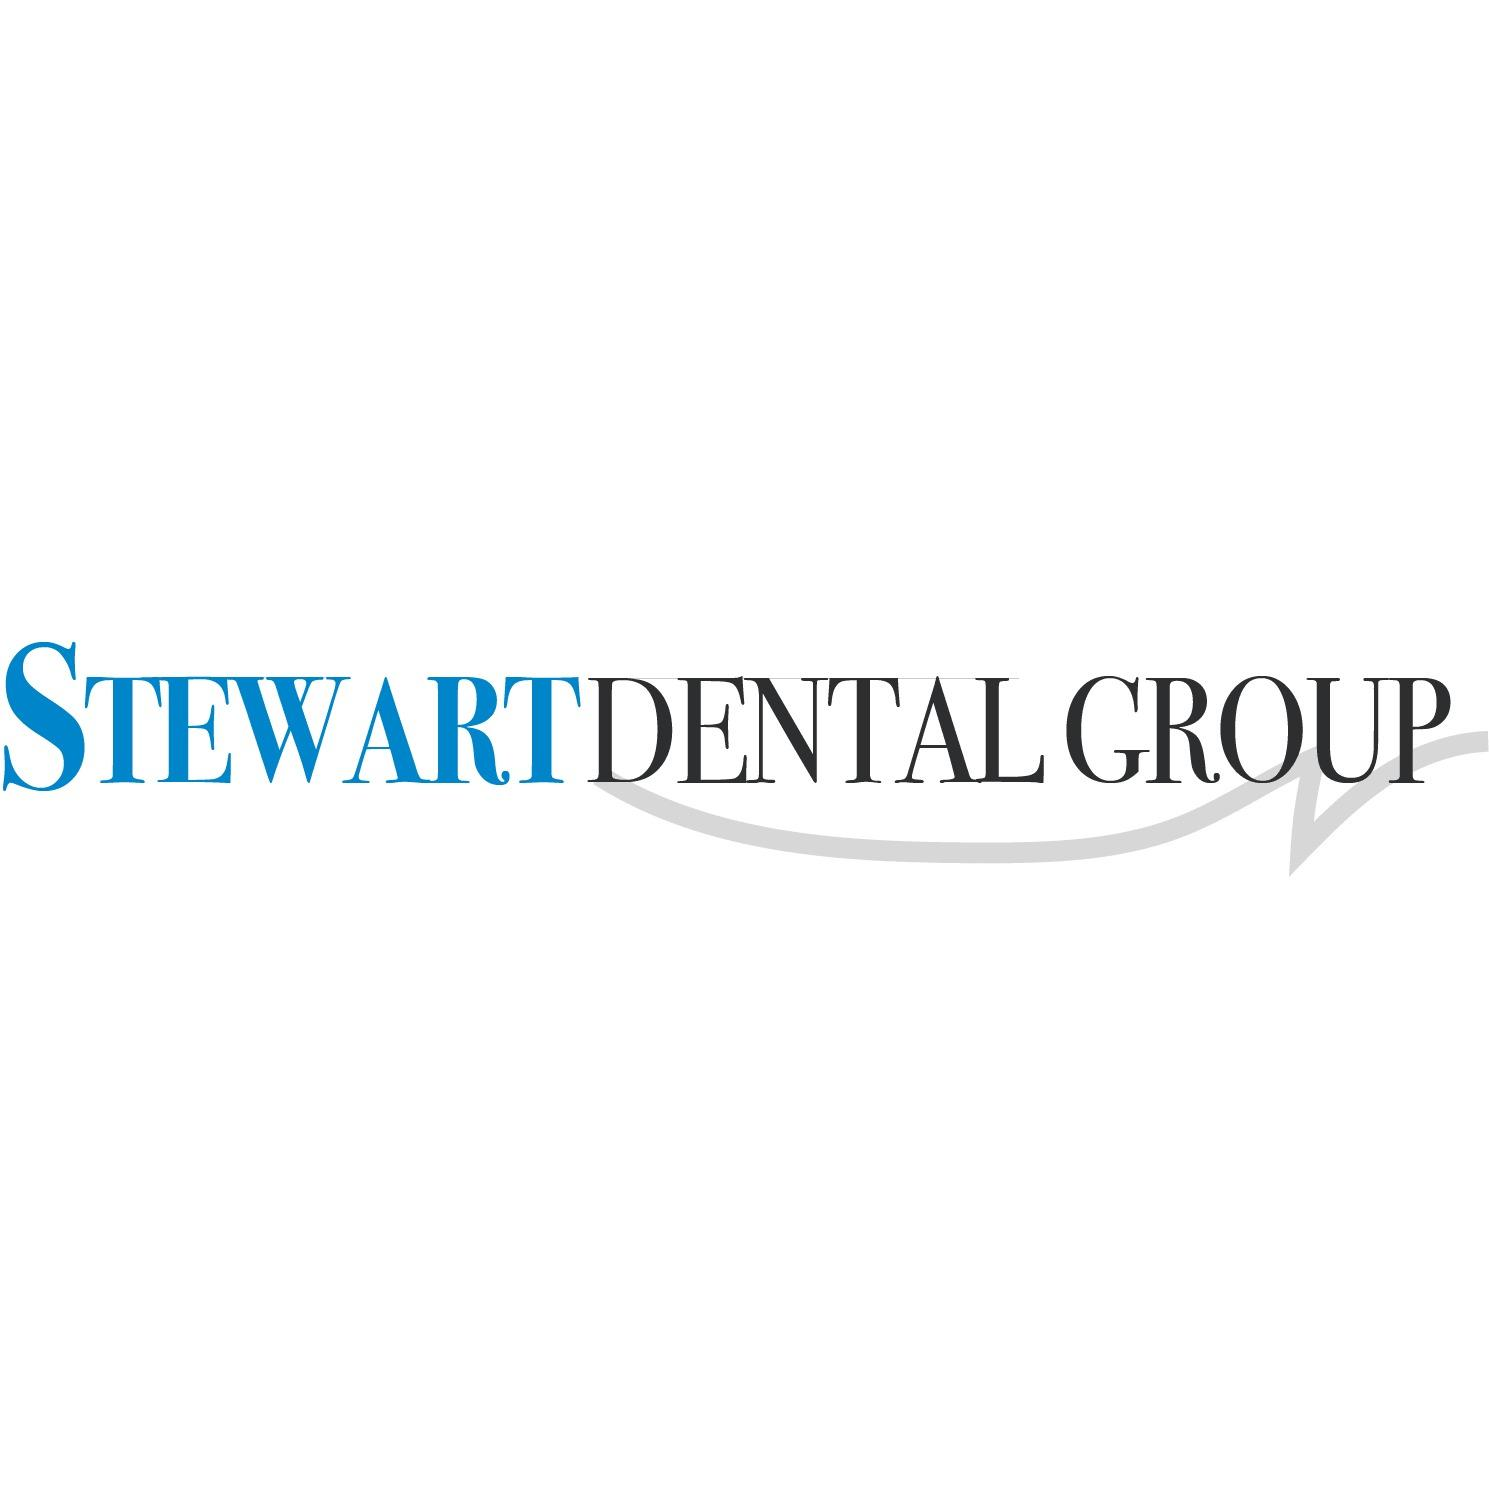 Stewart Dental Group